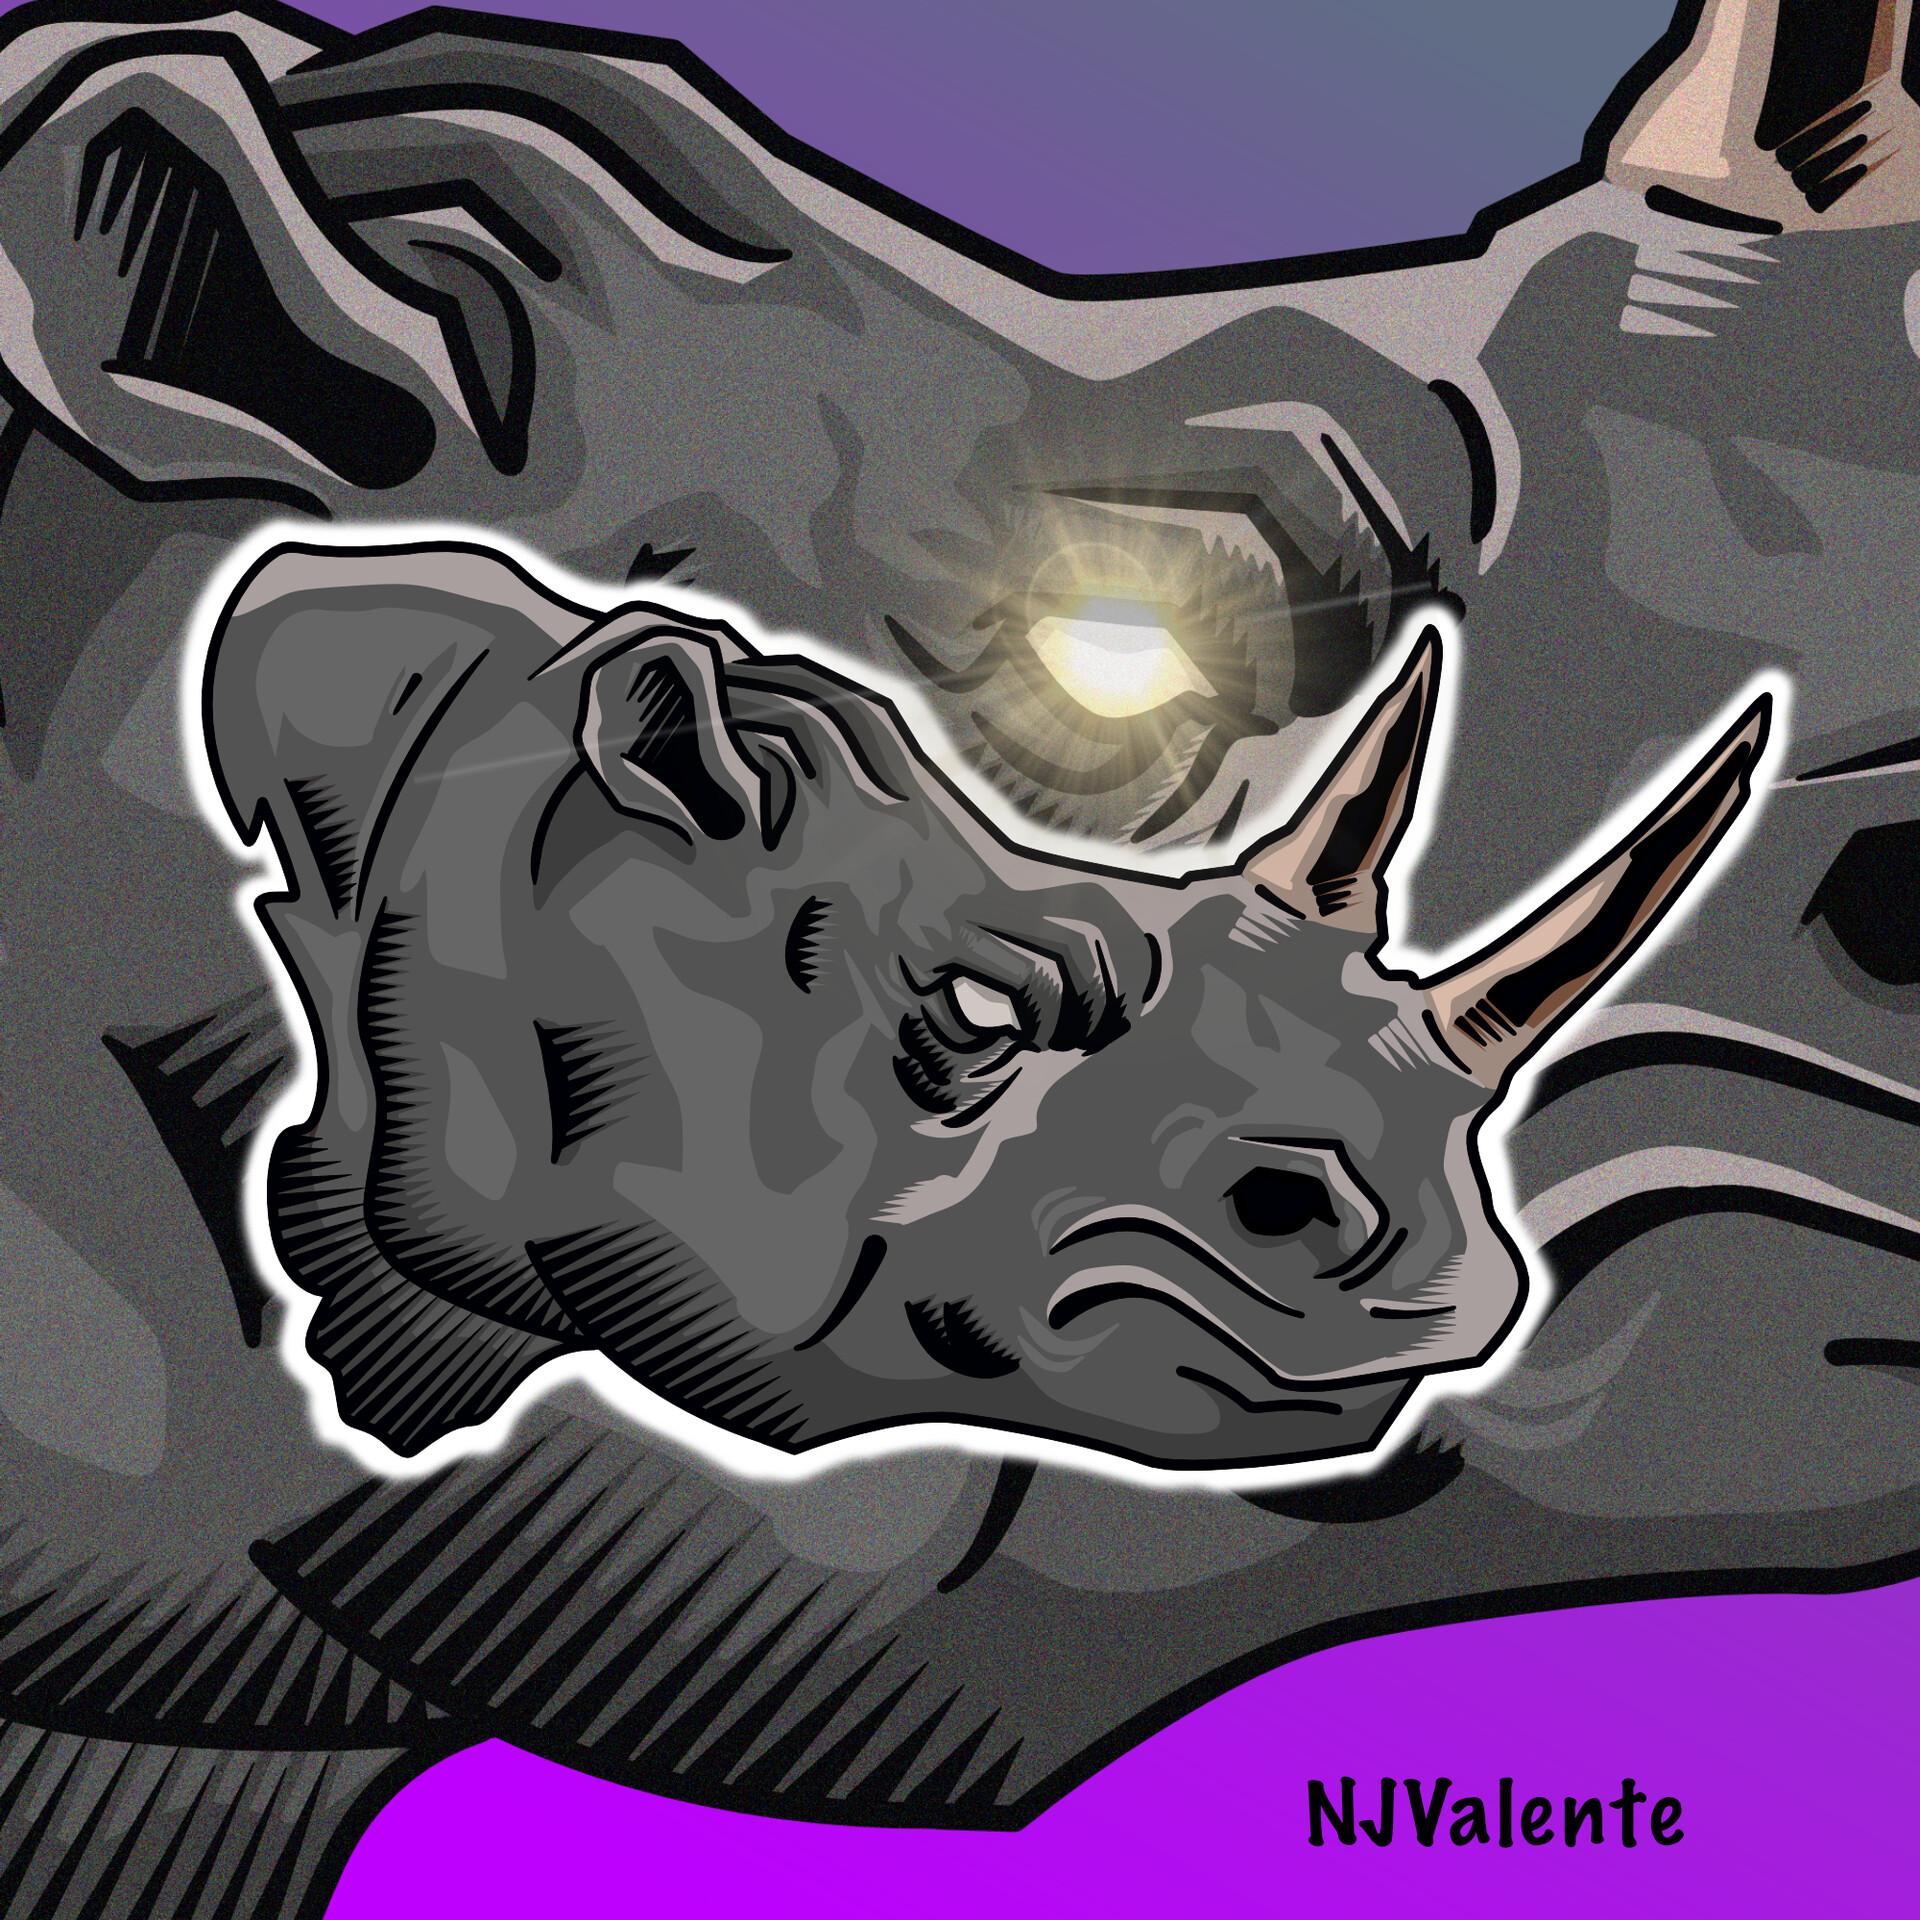 Nick valente rhino